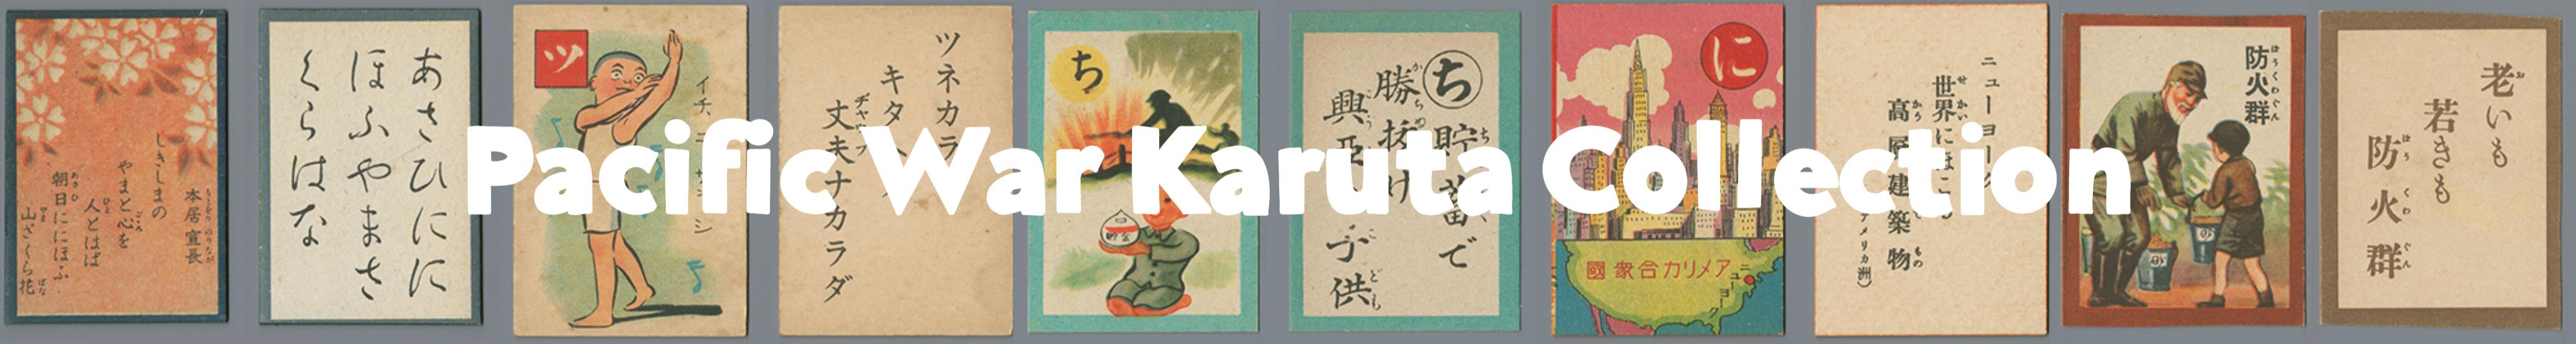 Pacific War Karuta Collection